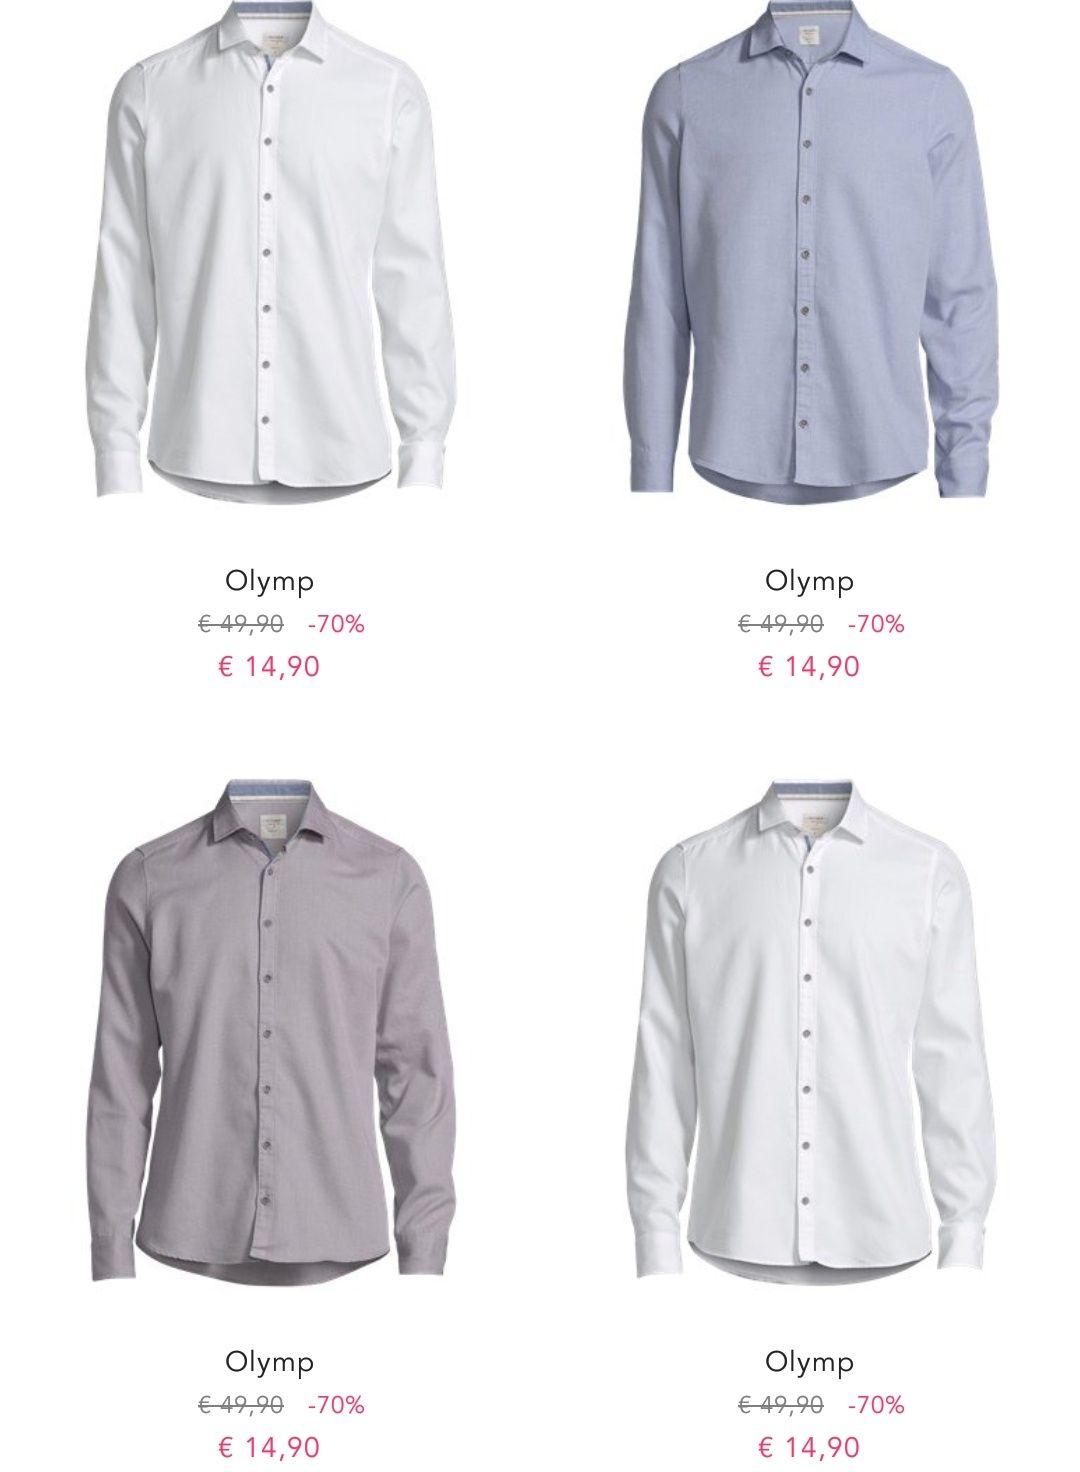 [BestSecret] Business Olymp Hemden ab 14,90€ + 5€ Versand